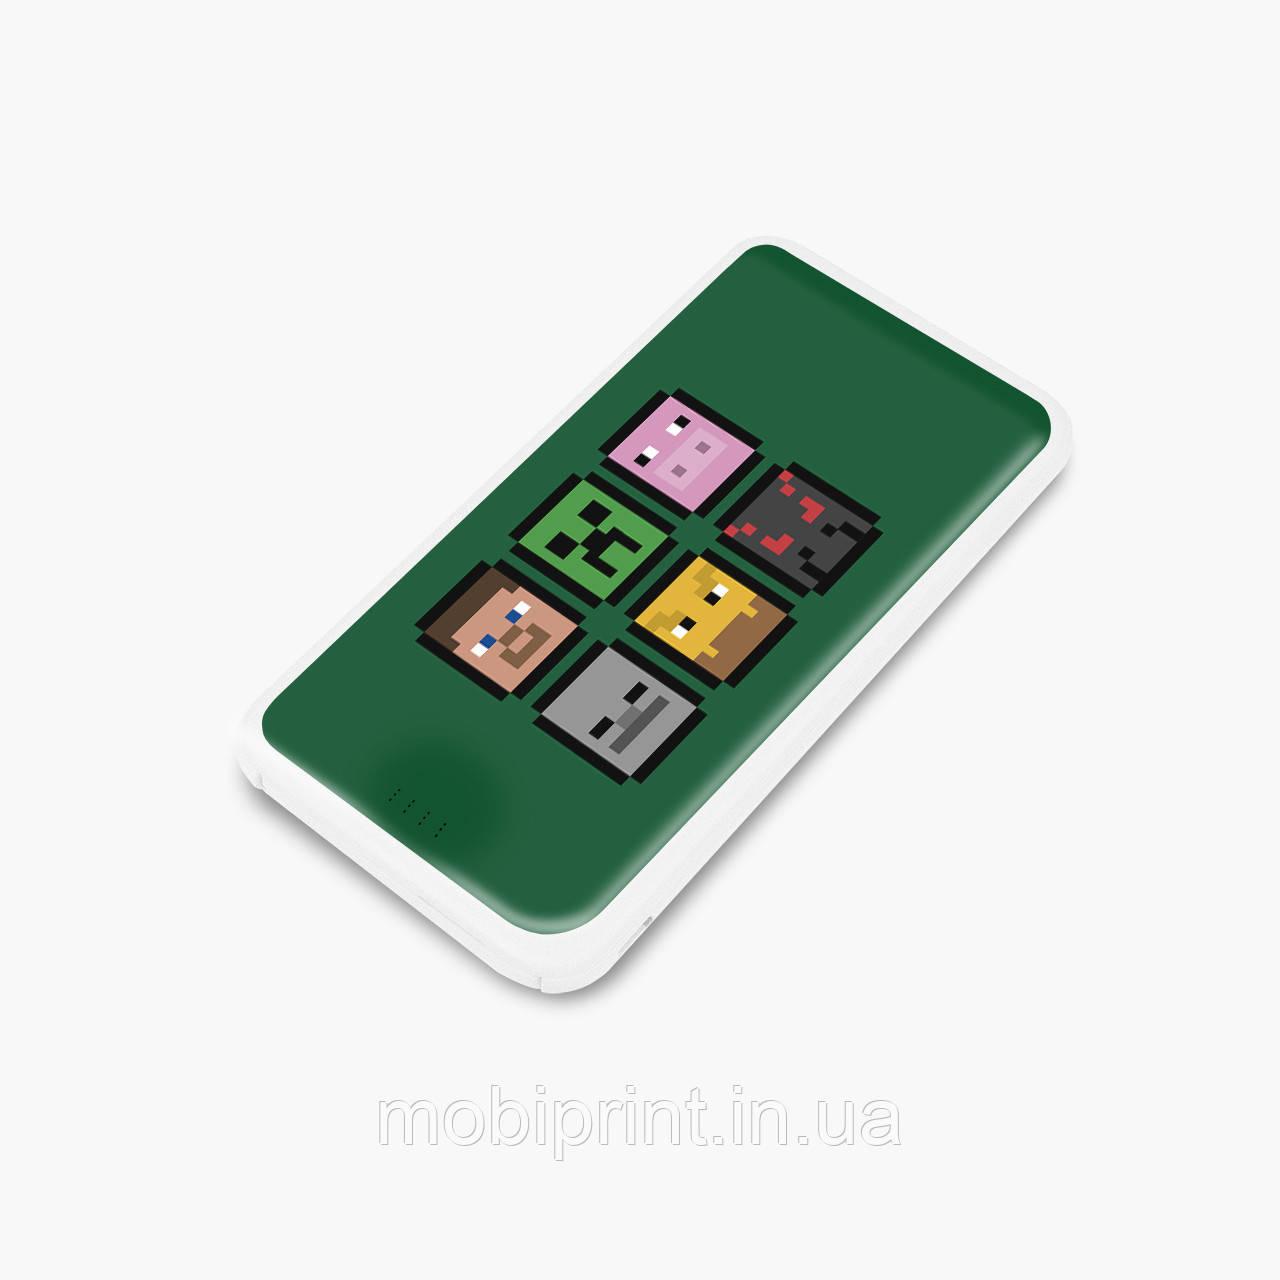 Повербанк (Power Bank) 5000 mAh Майнкрафт (Minecraft) (25938-1173) Белый